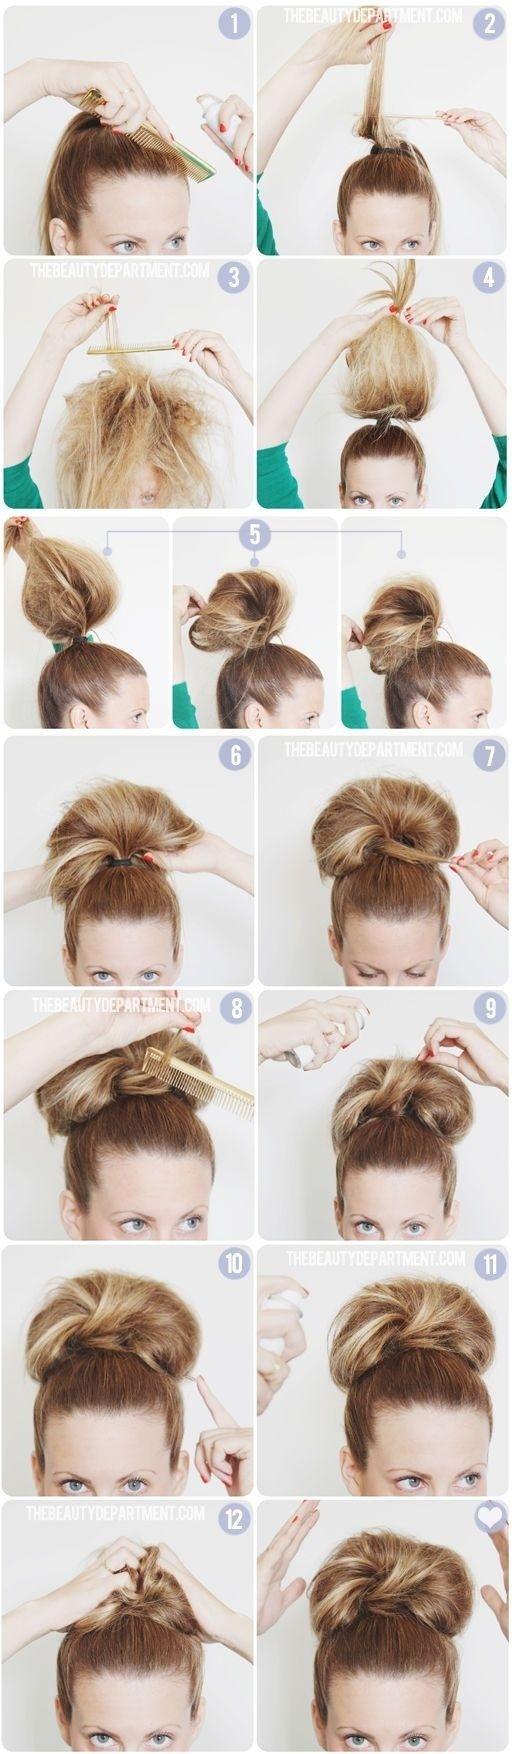 best hair tutorial images on pinterest